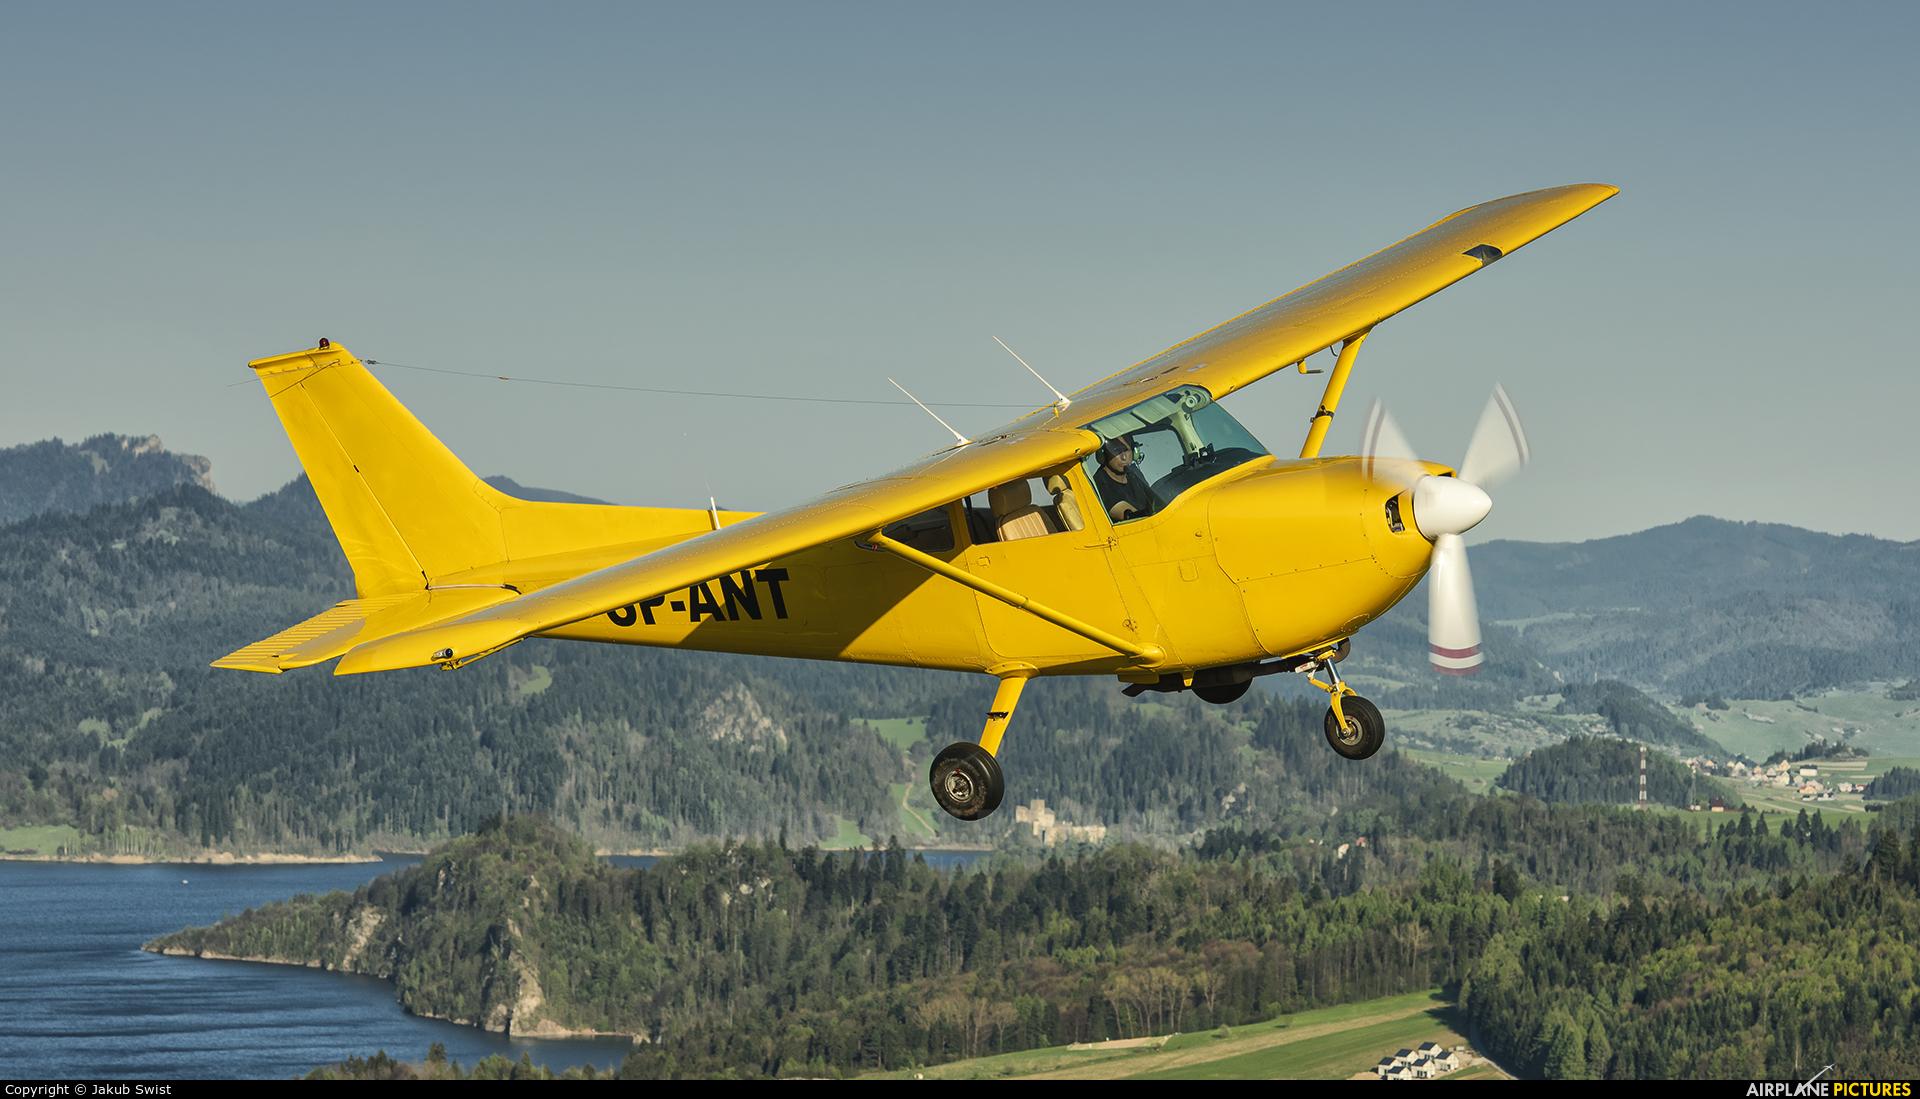 Aeroklub Nowy Targ SP-ANT aircraft at In Flight - Poland